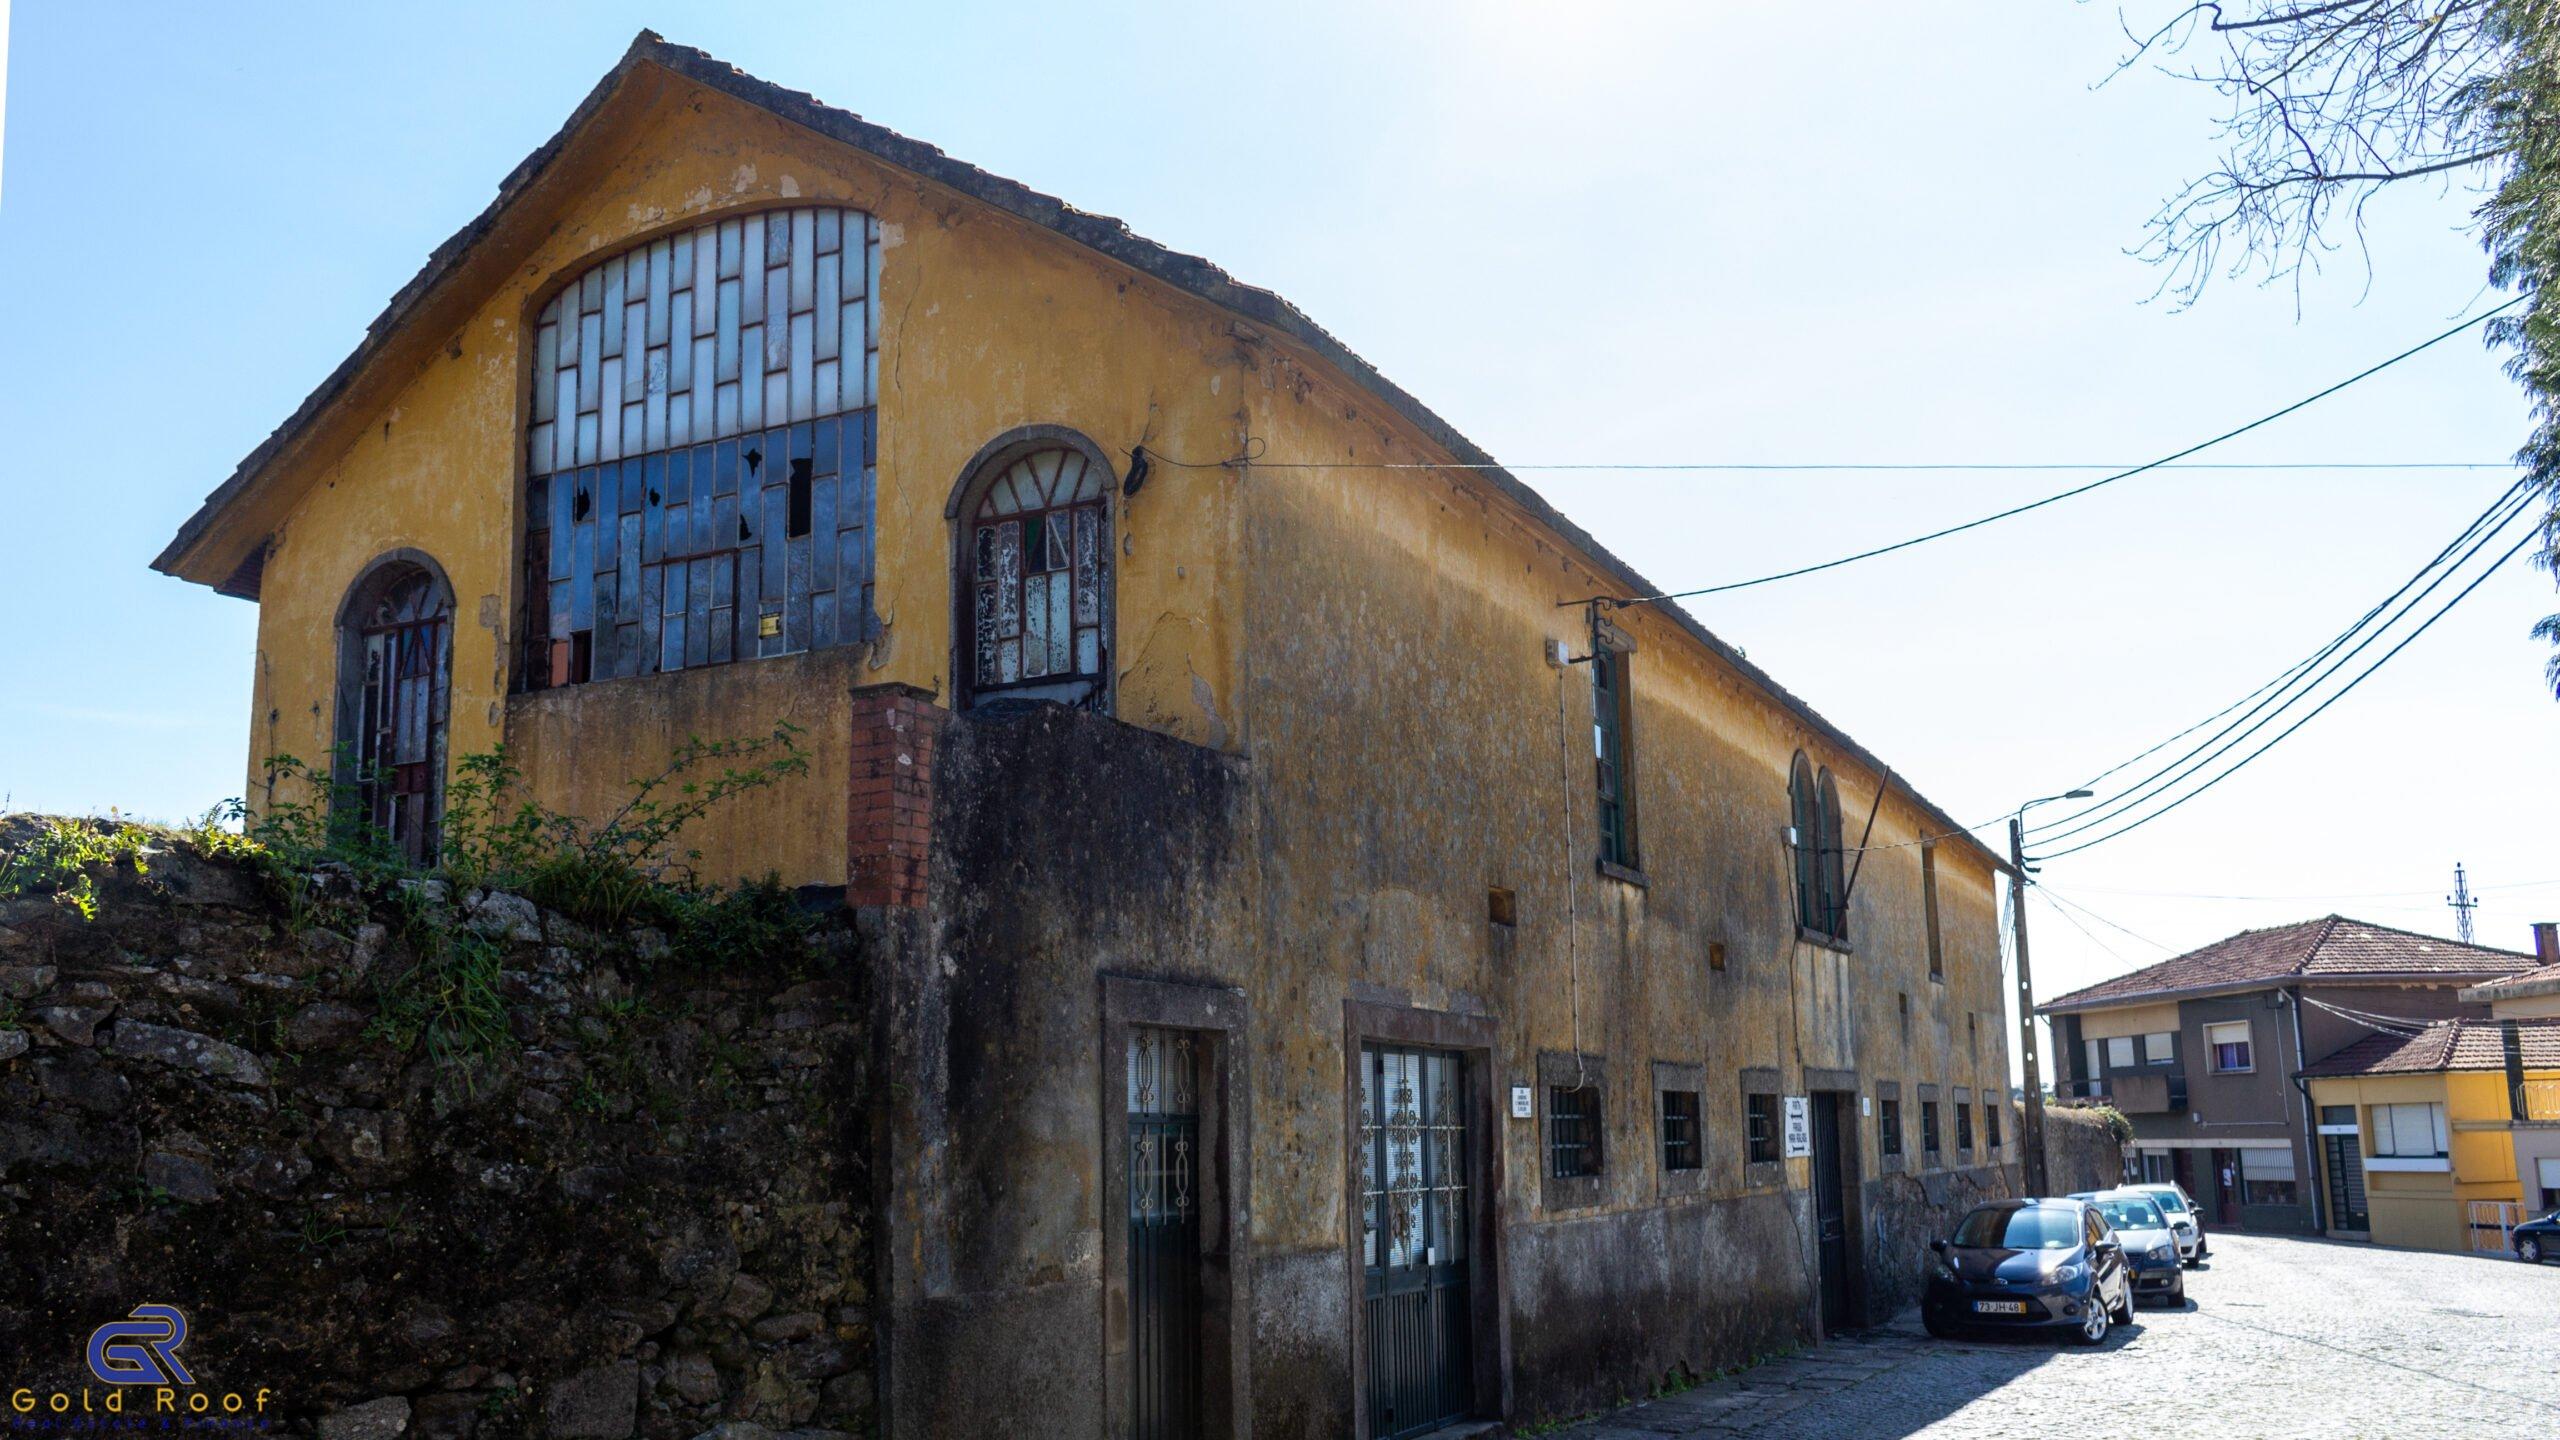 Construction Land with 88,000 m2 for real estate development, Arcozelo, Vila Nova de Gaia